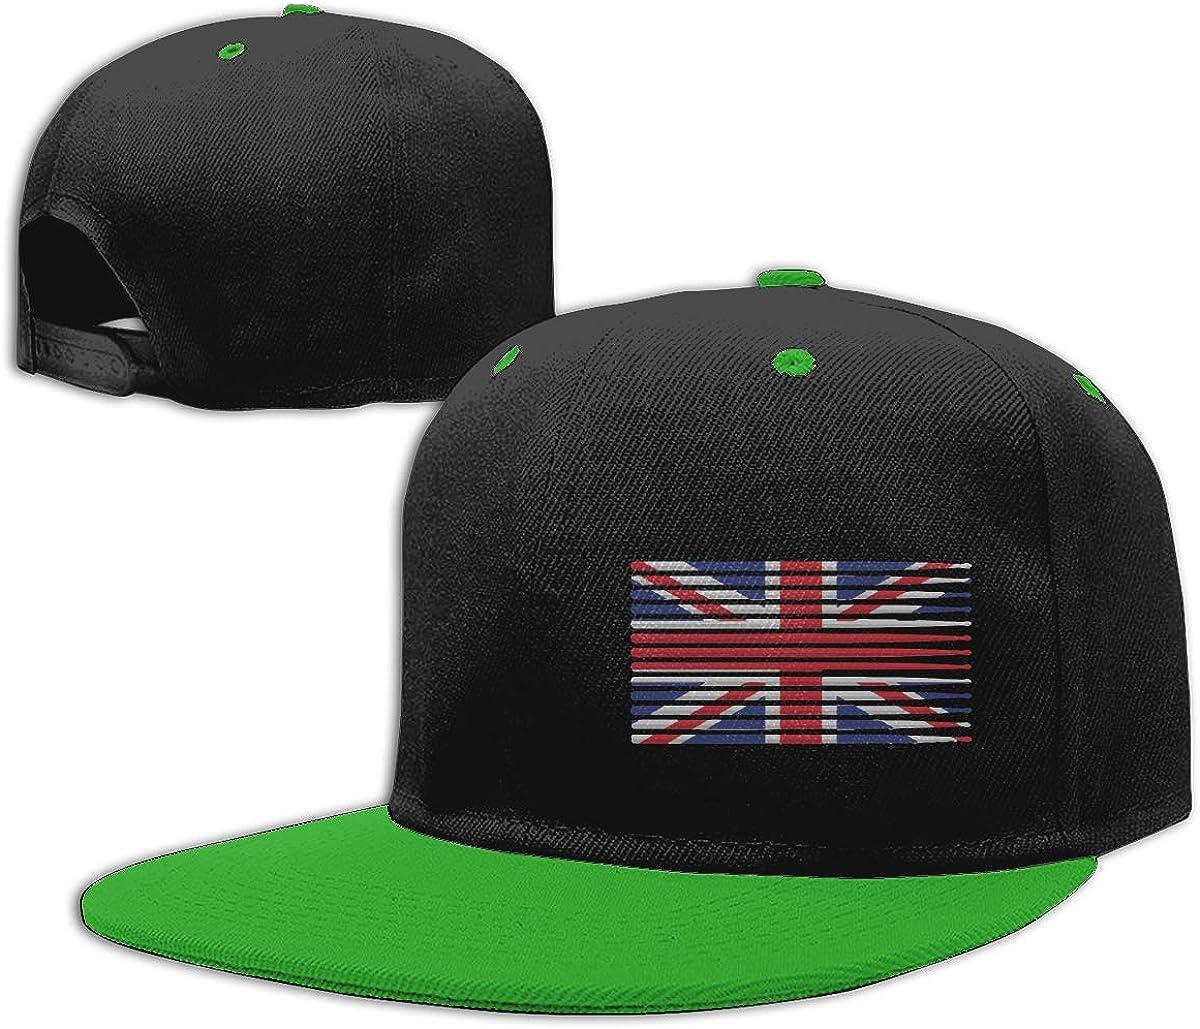 United Kingdom Drummer Classic Flat Peaked Baseball Caps Men and Women Dad Hat